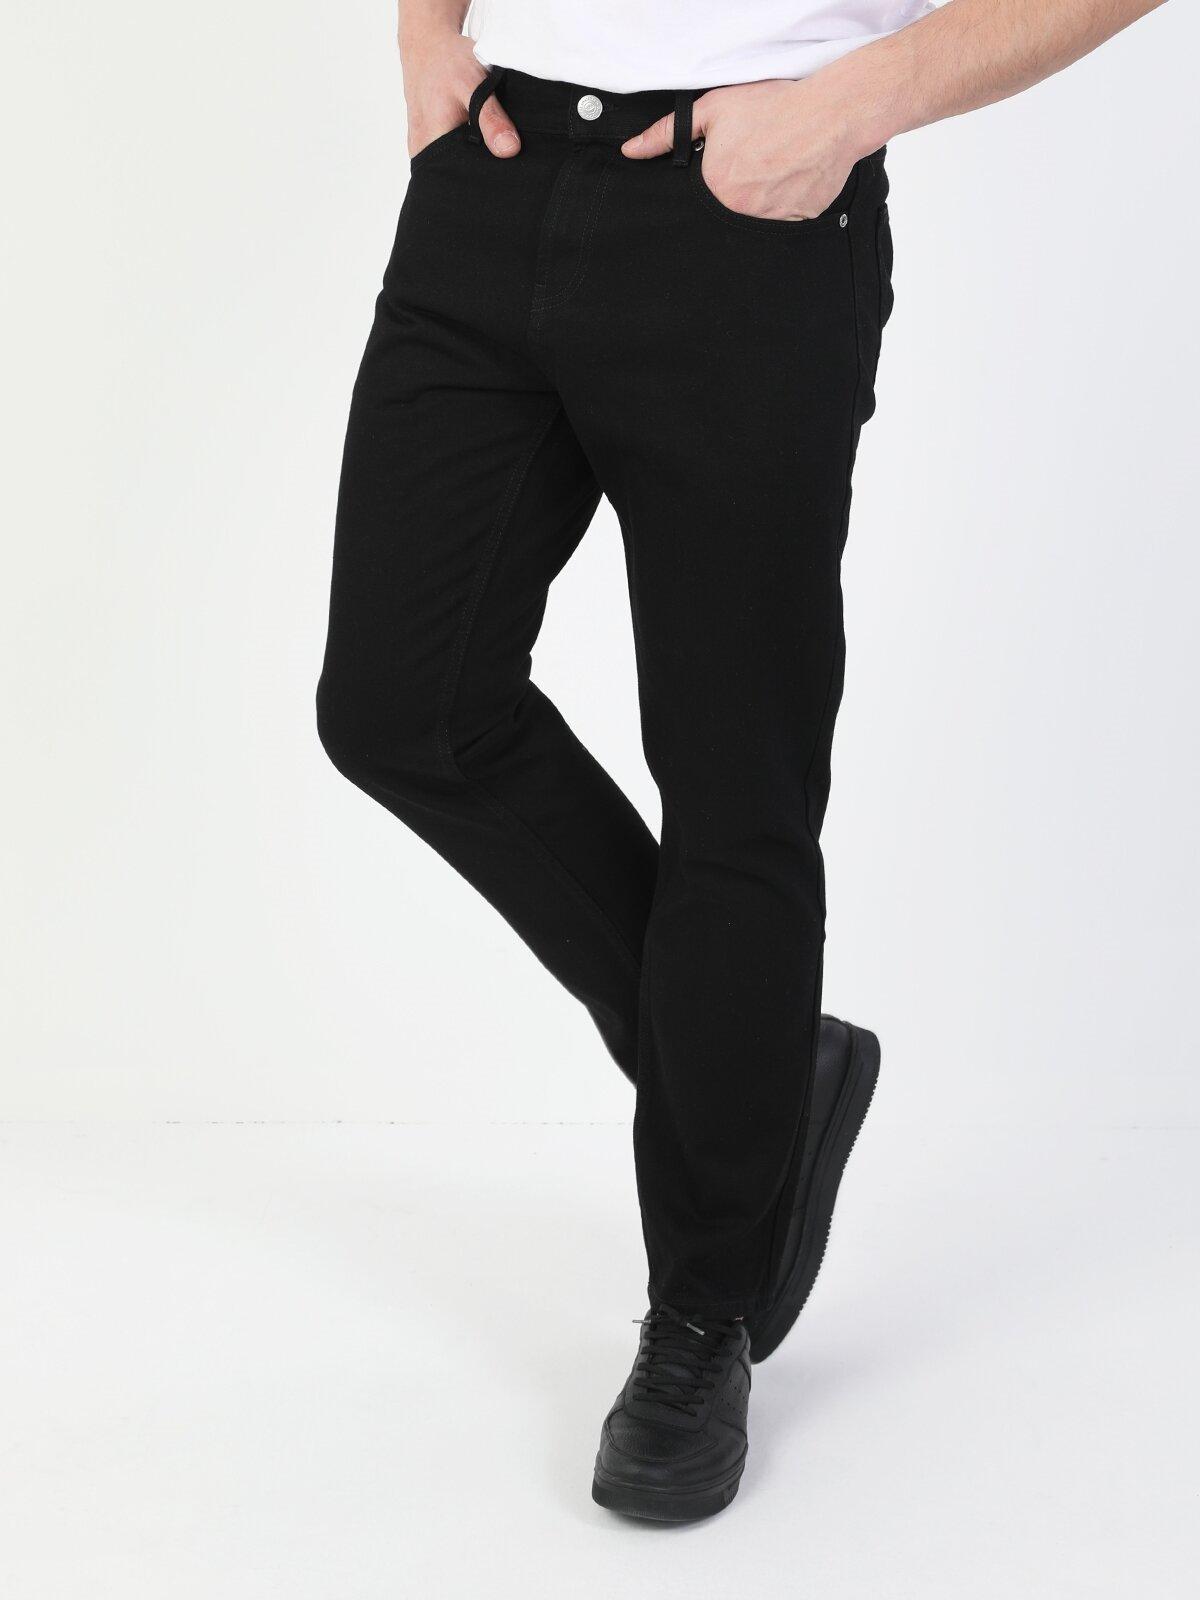 044 Karl Düz Kesim Siyah Erkek  Erkek Jean Pantolon